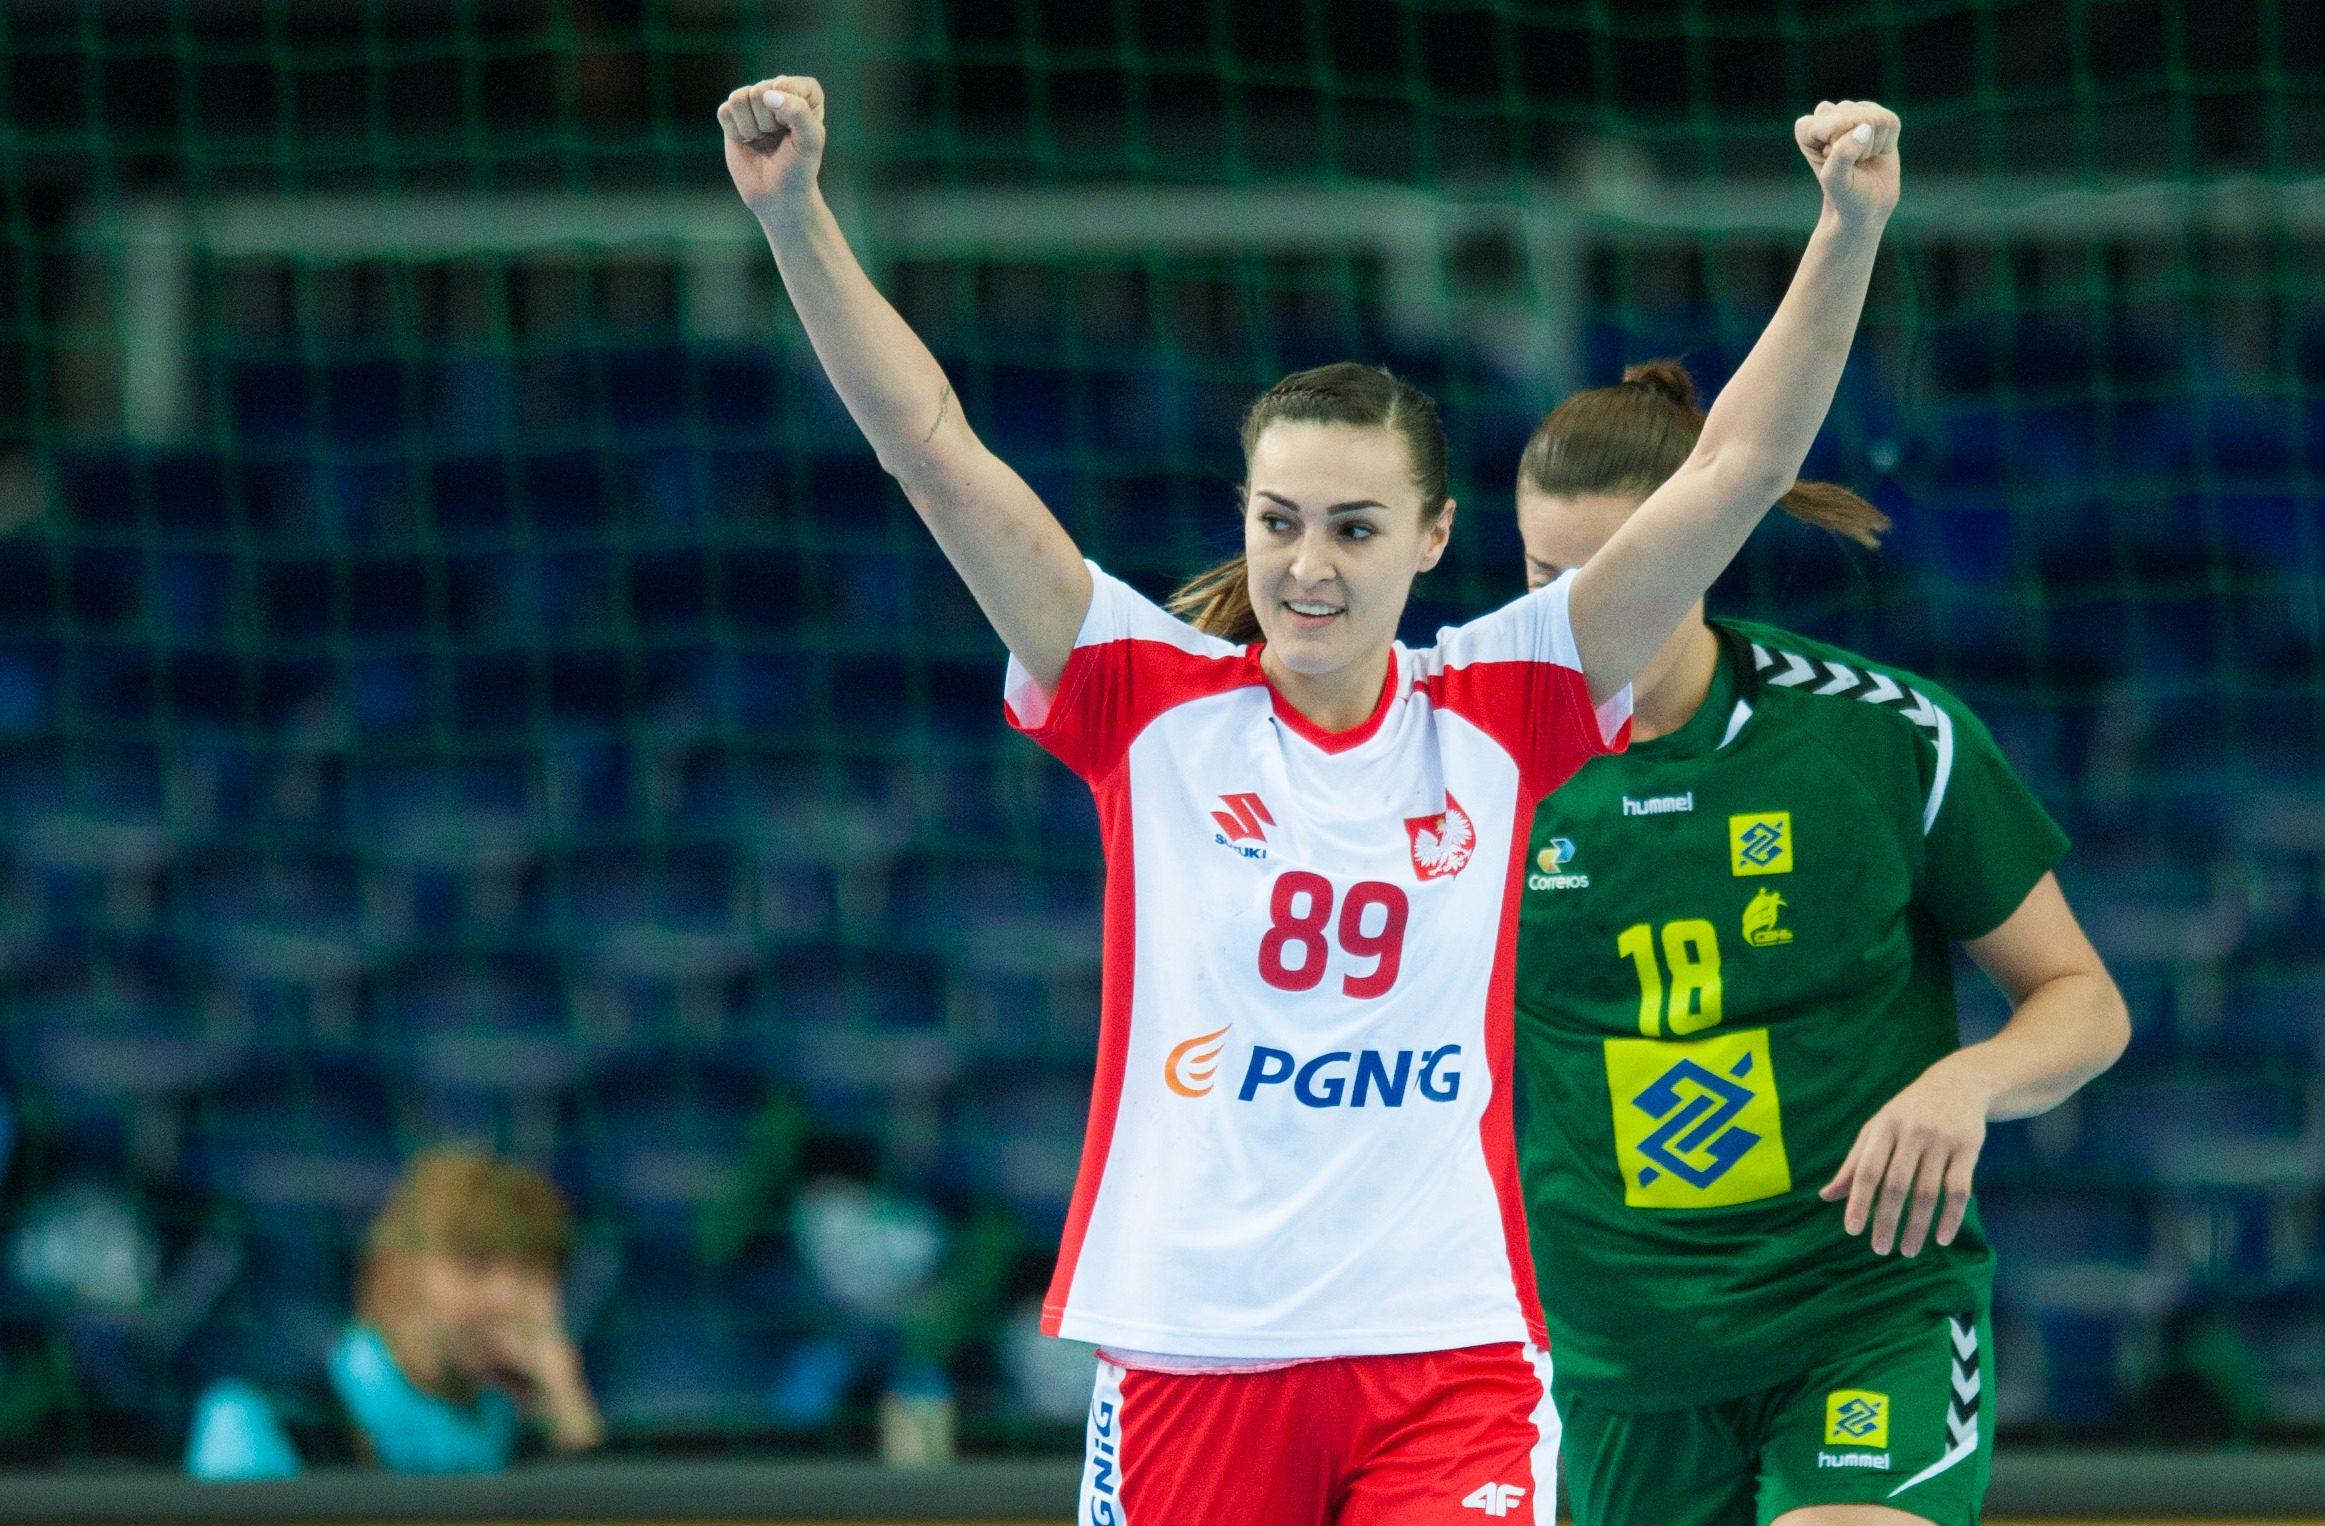 Fot. Łukasz Laskowski (PressFocus)